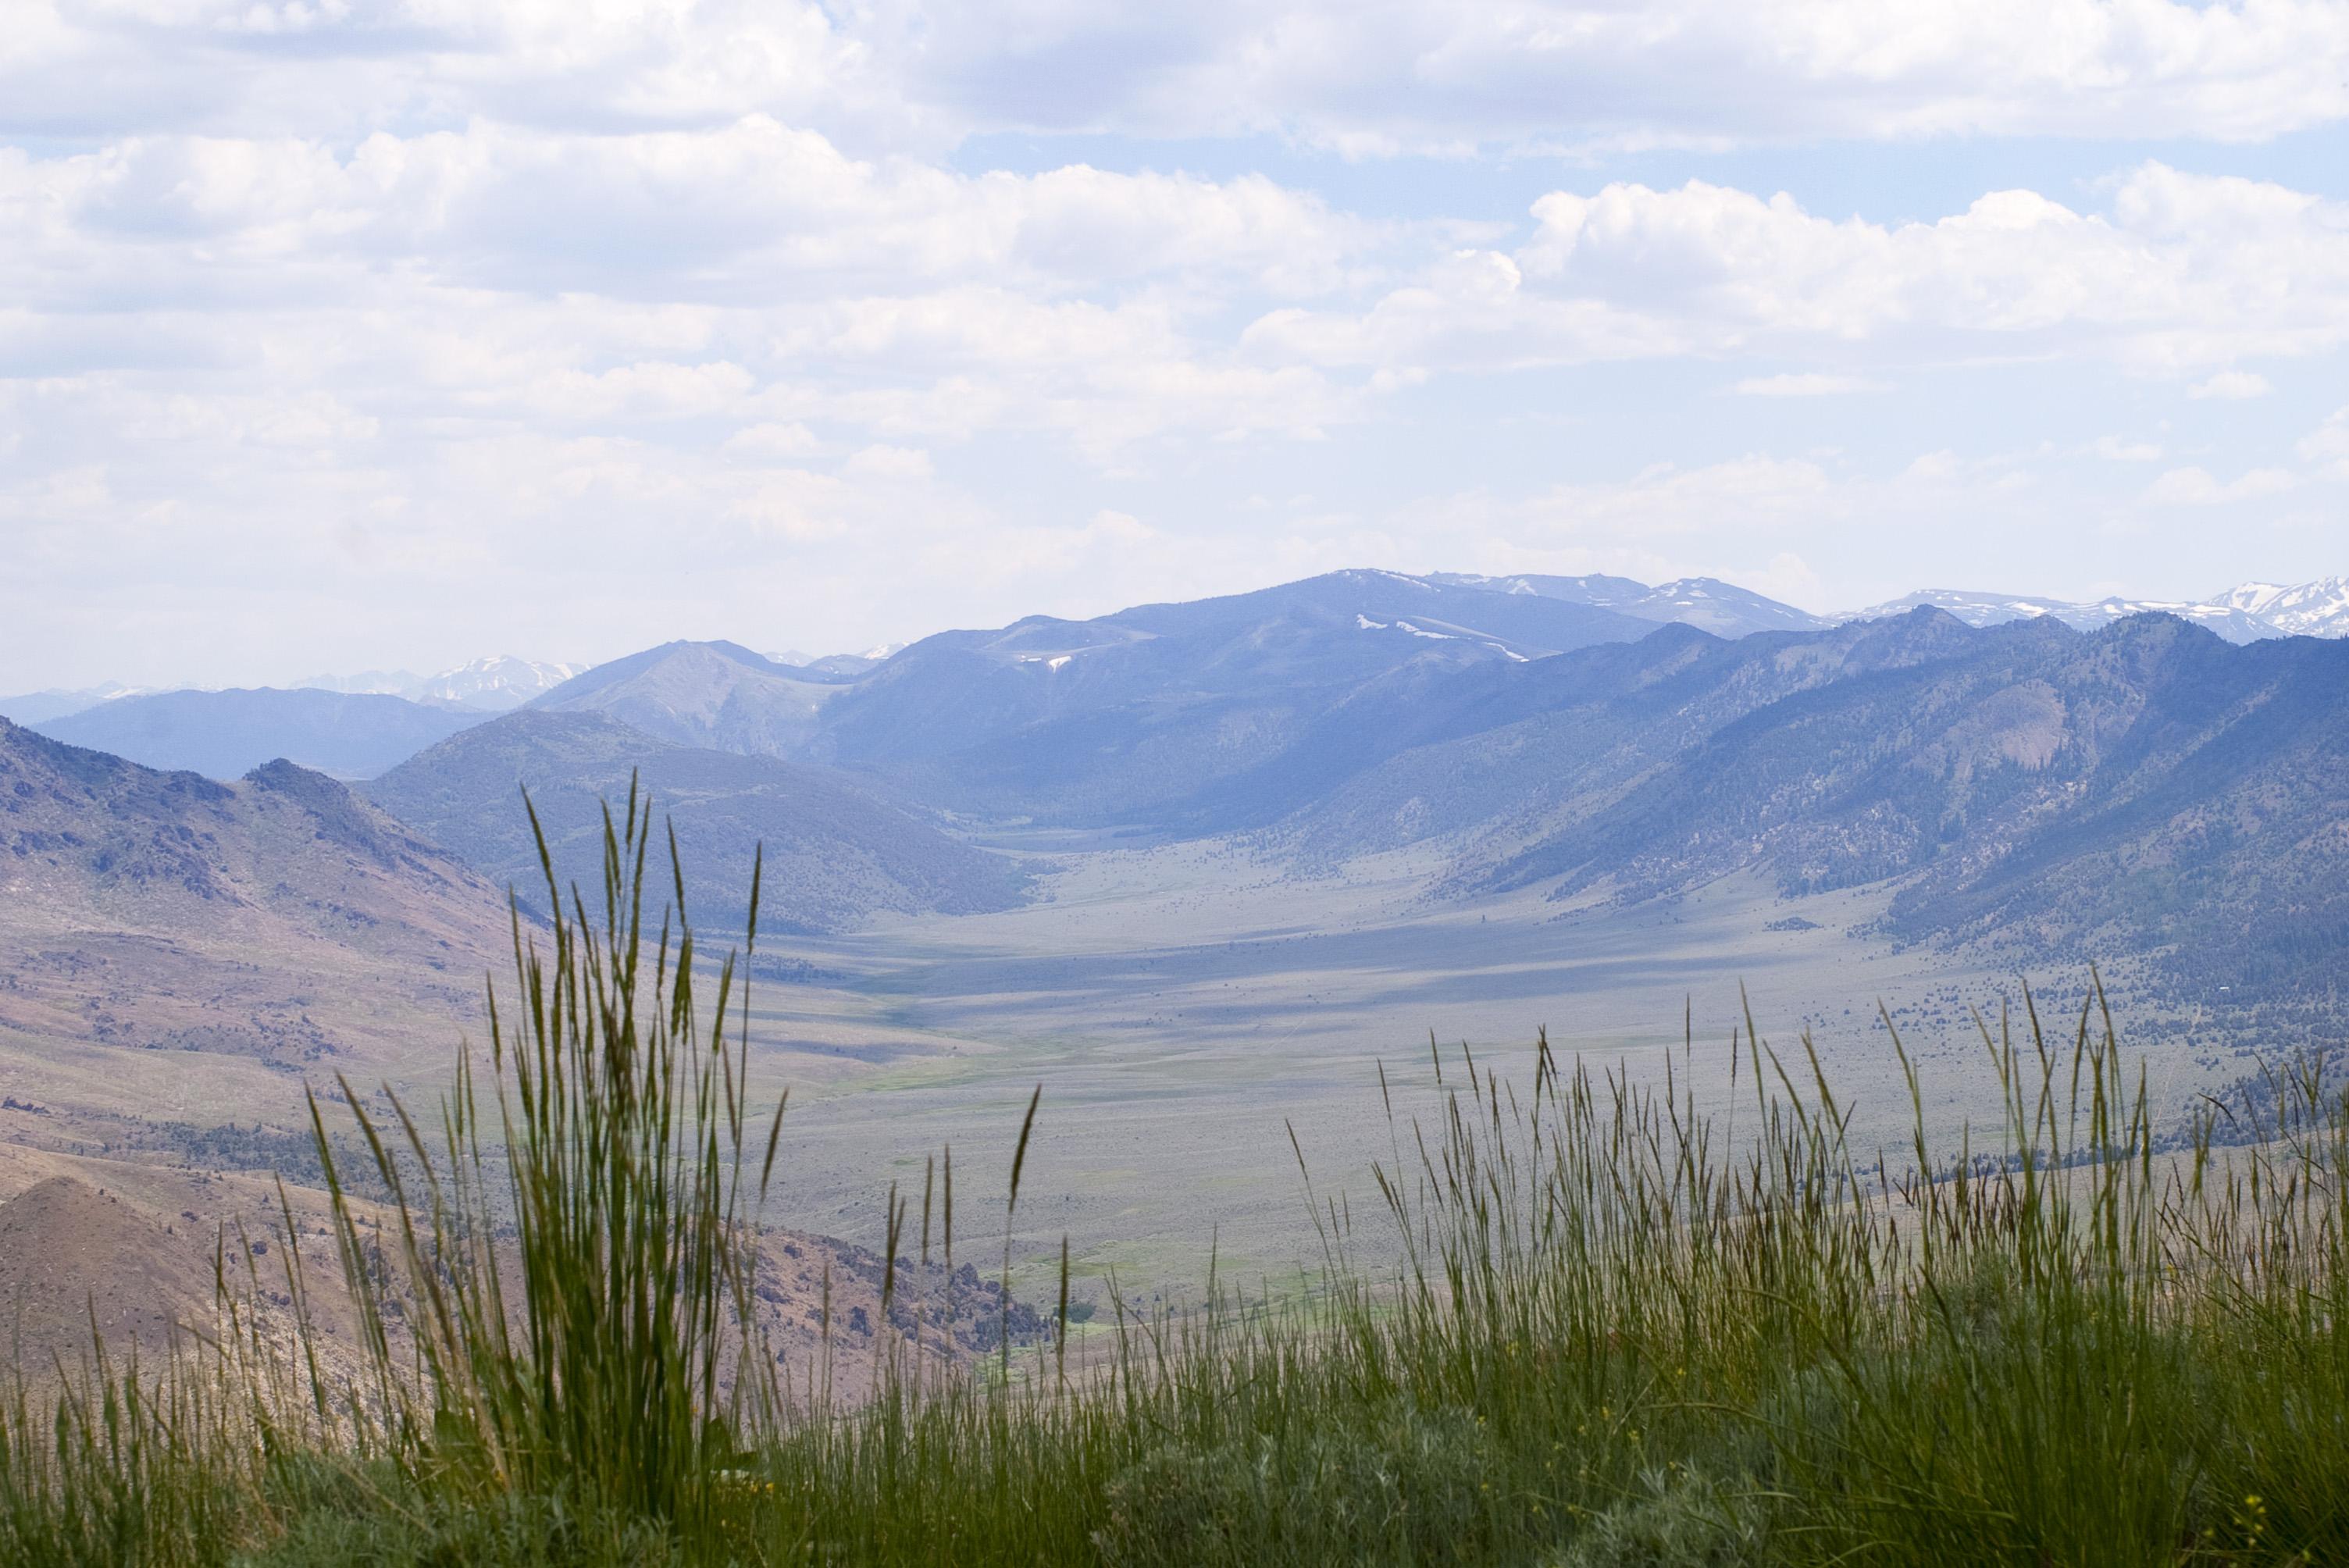 Free stock photo 3027 sierra navada valley freeimageslive for Sierra valley